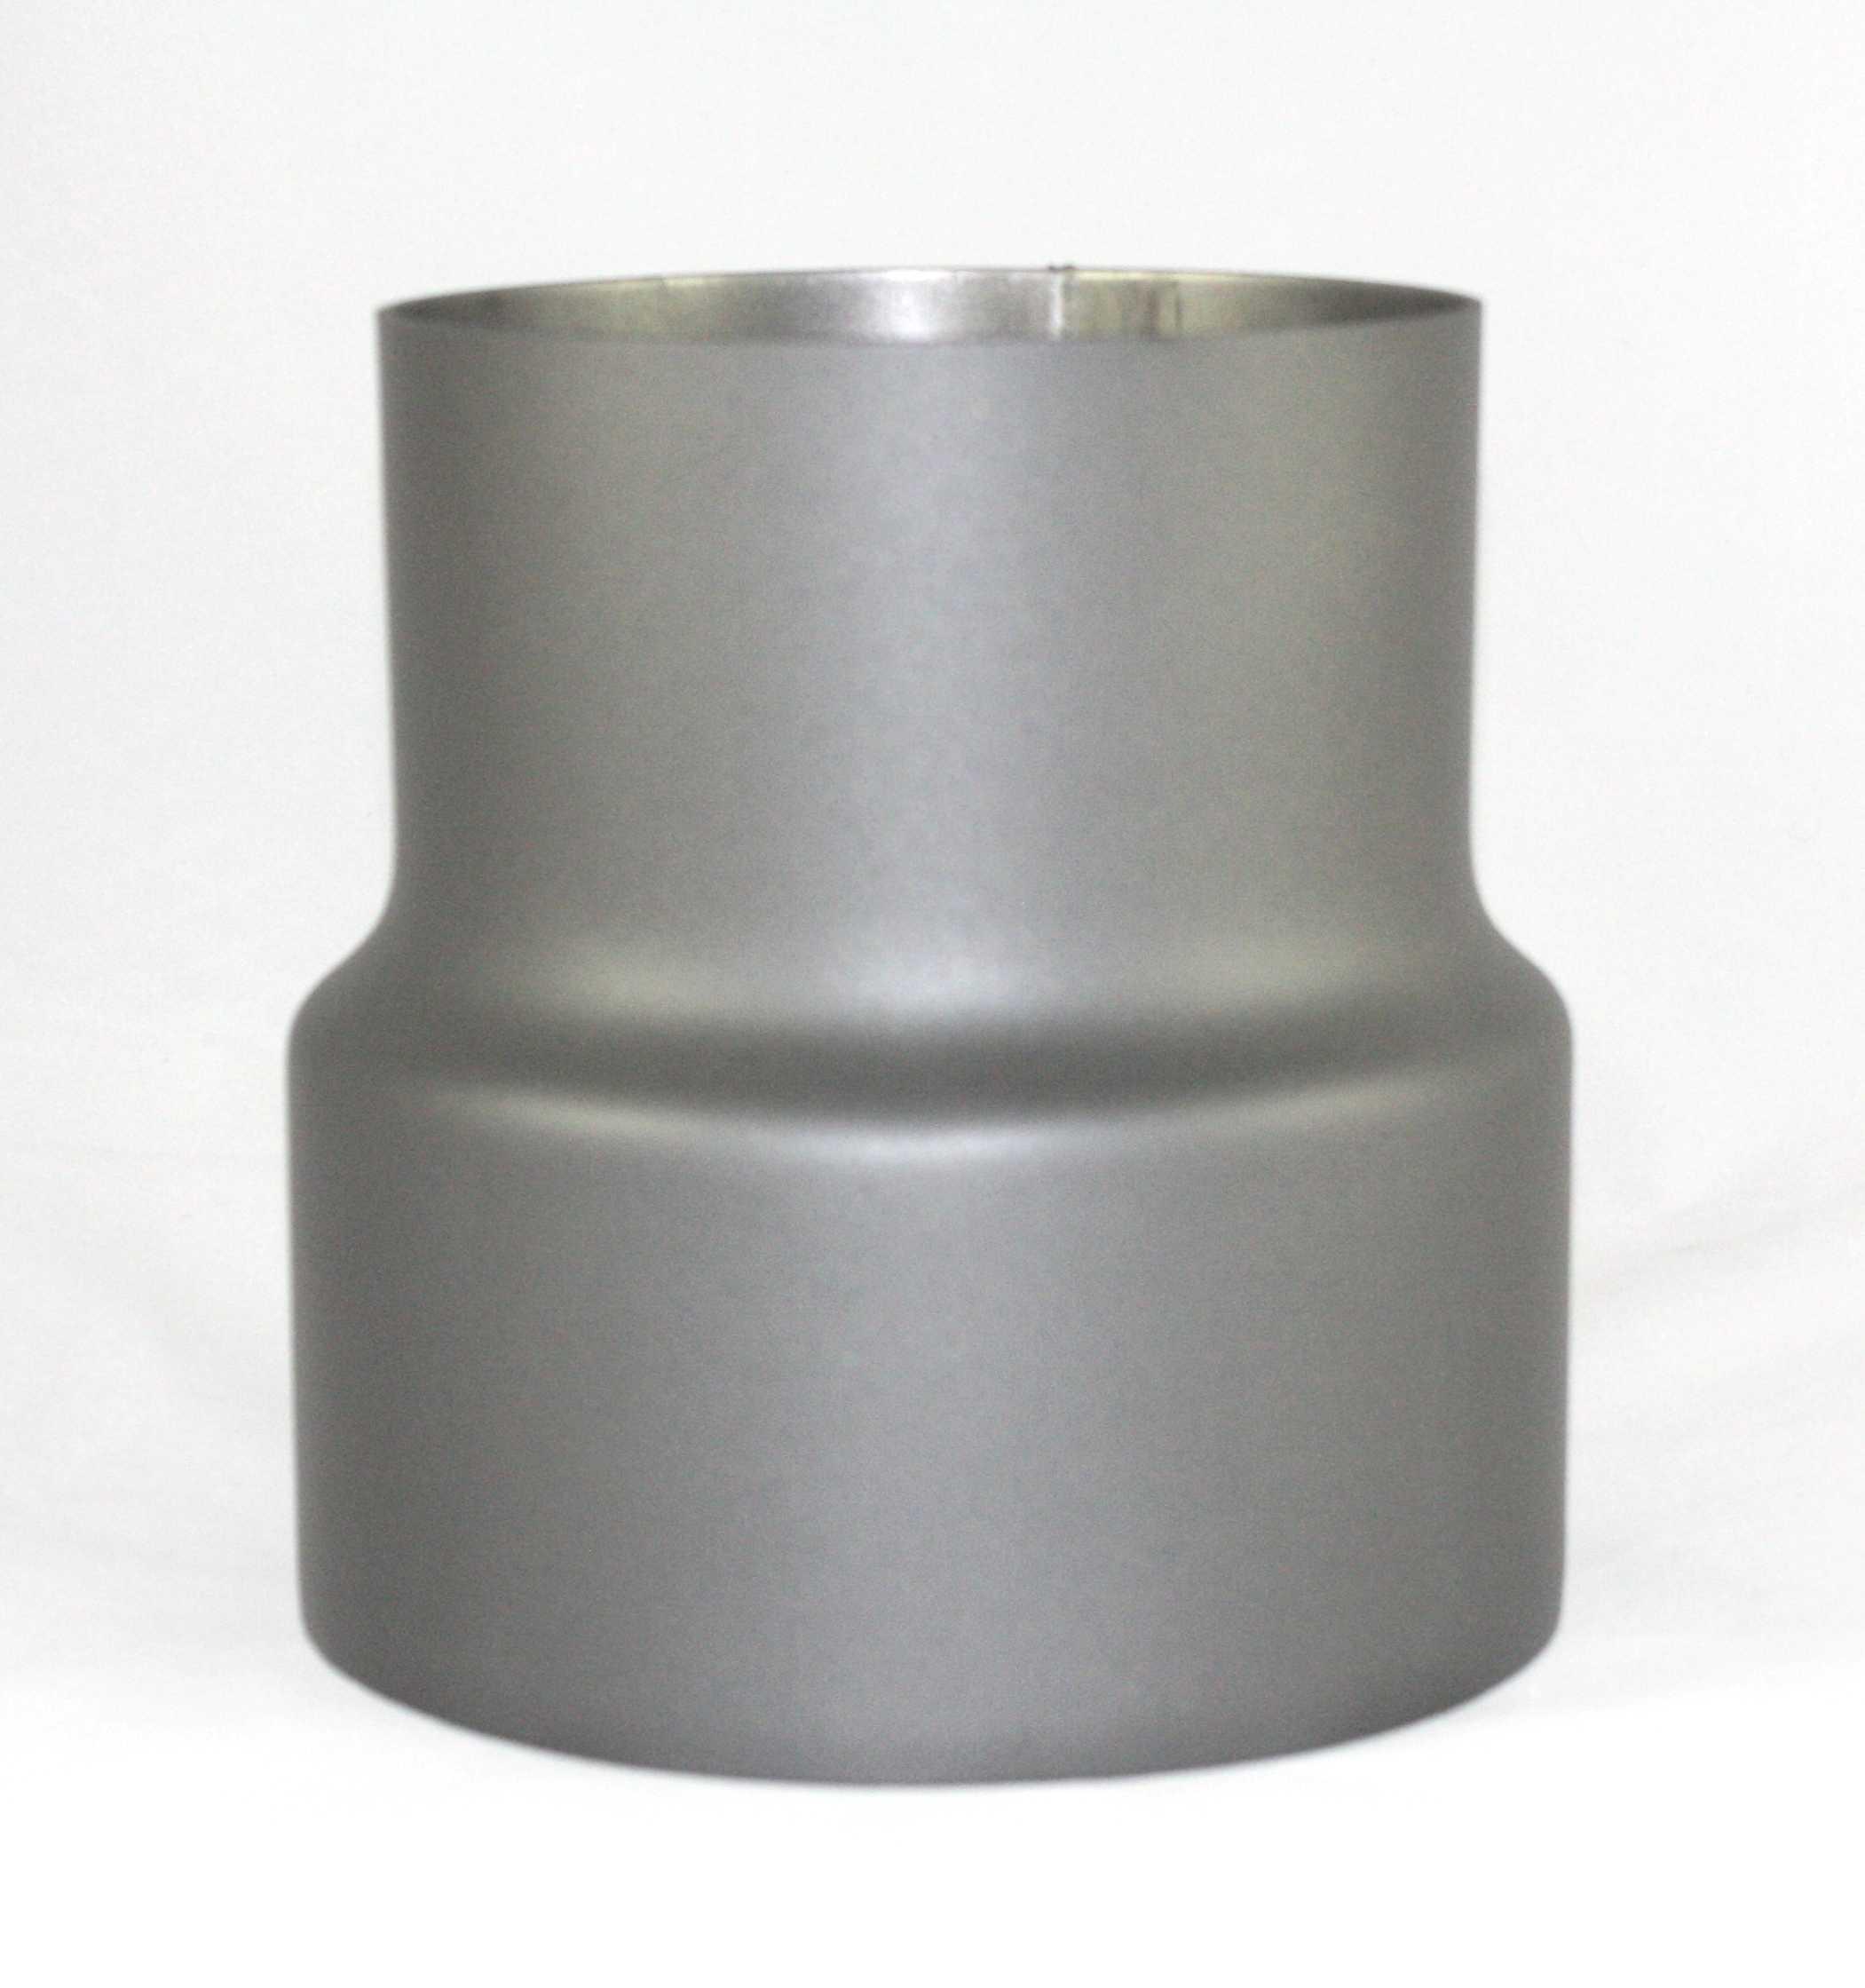 reduzierung 150 120 mm reduzierung ofenrohr gussgrau kaminzubeh r. Black Bedroom Furniture Sets. Home Design Ideas